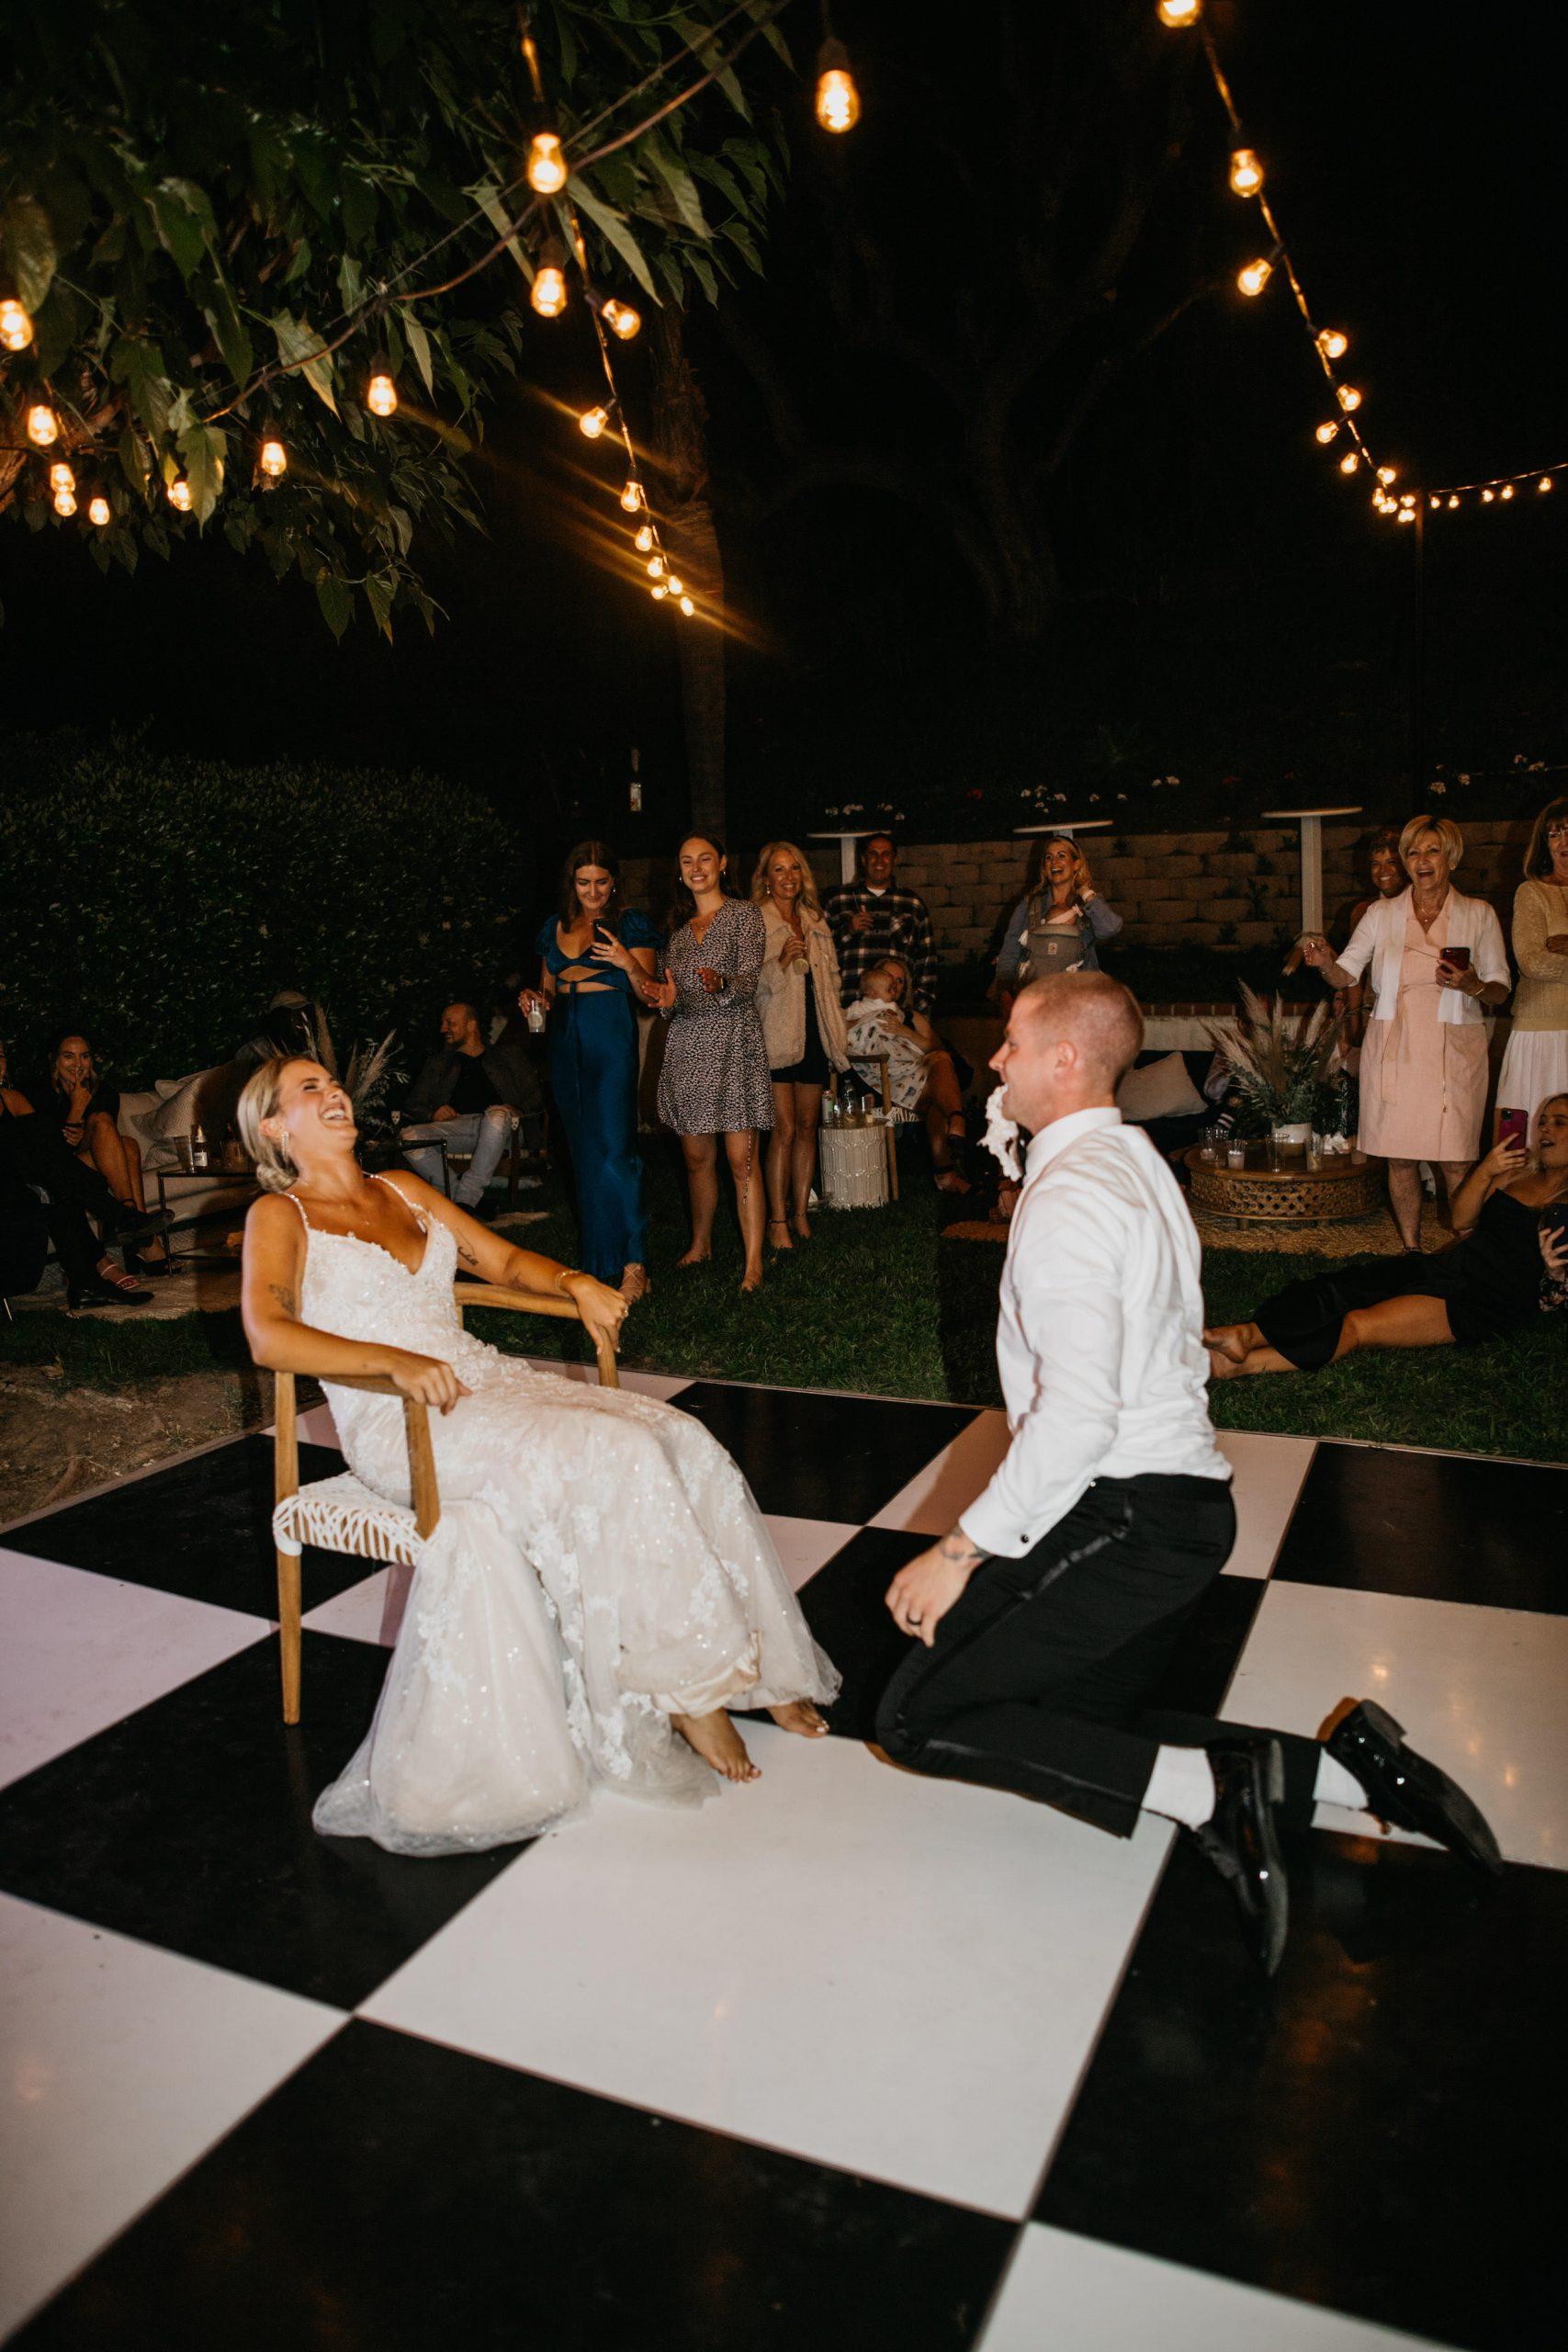 Laguna Beach Backyard Wedding, image by Fatima Elreda Photo